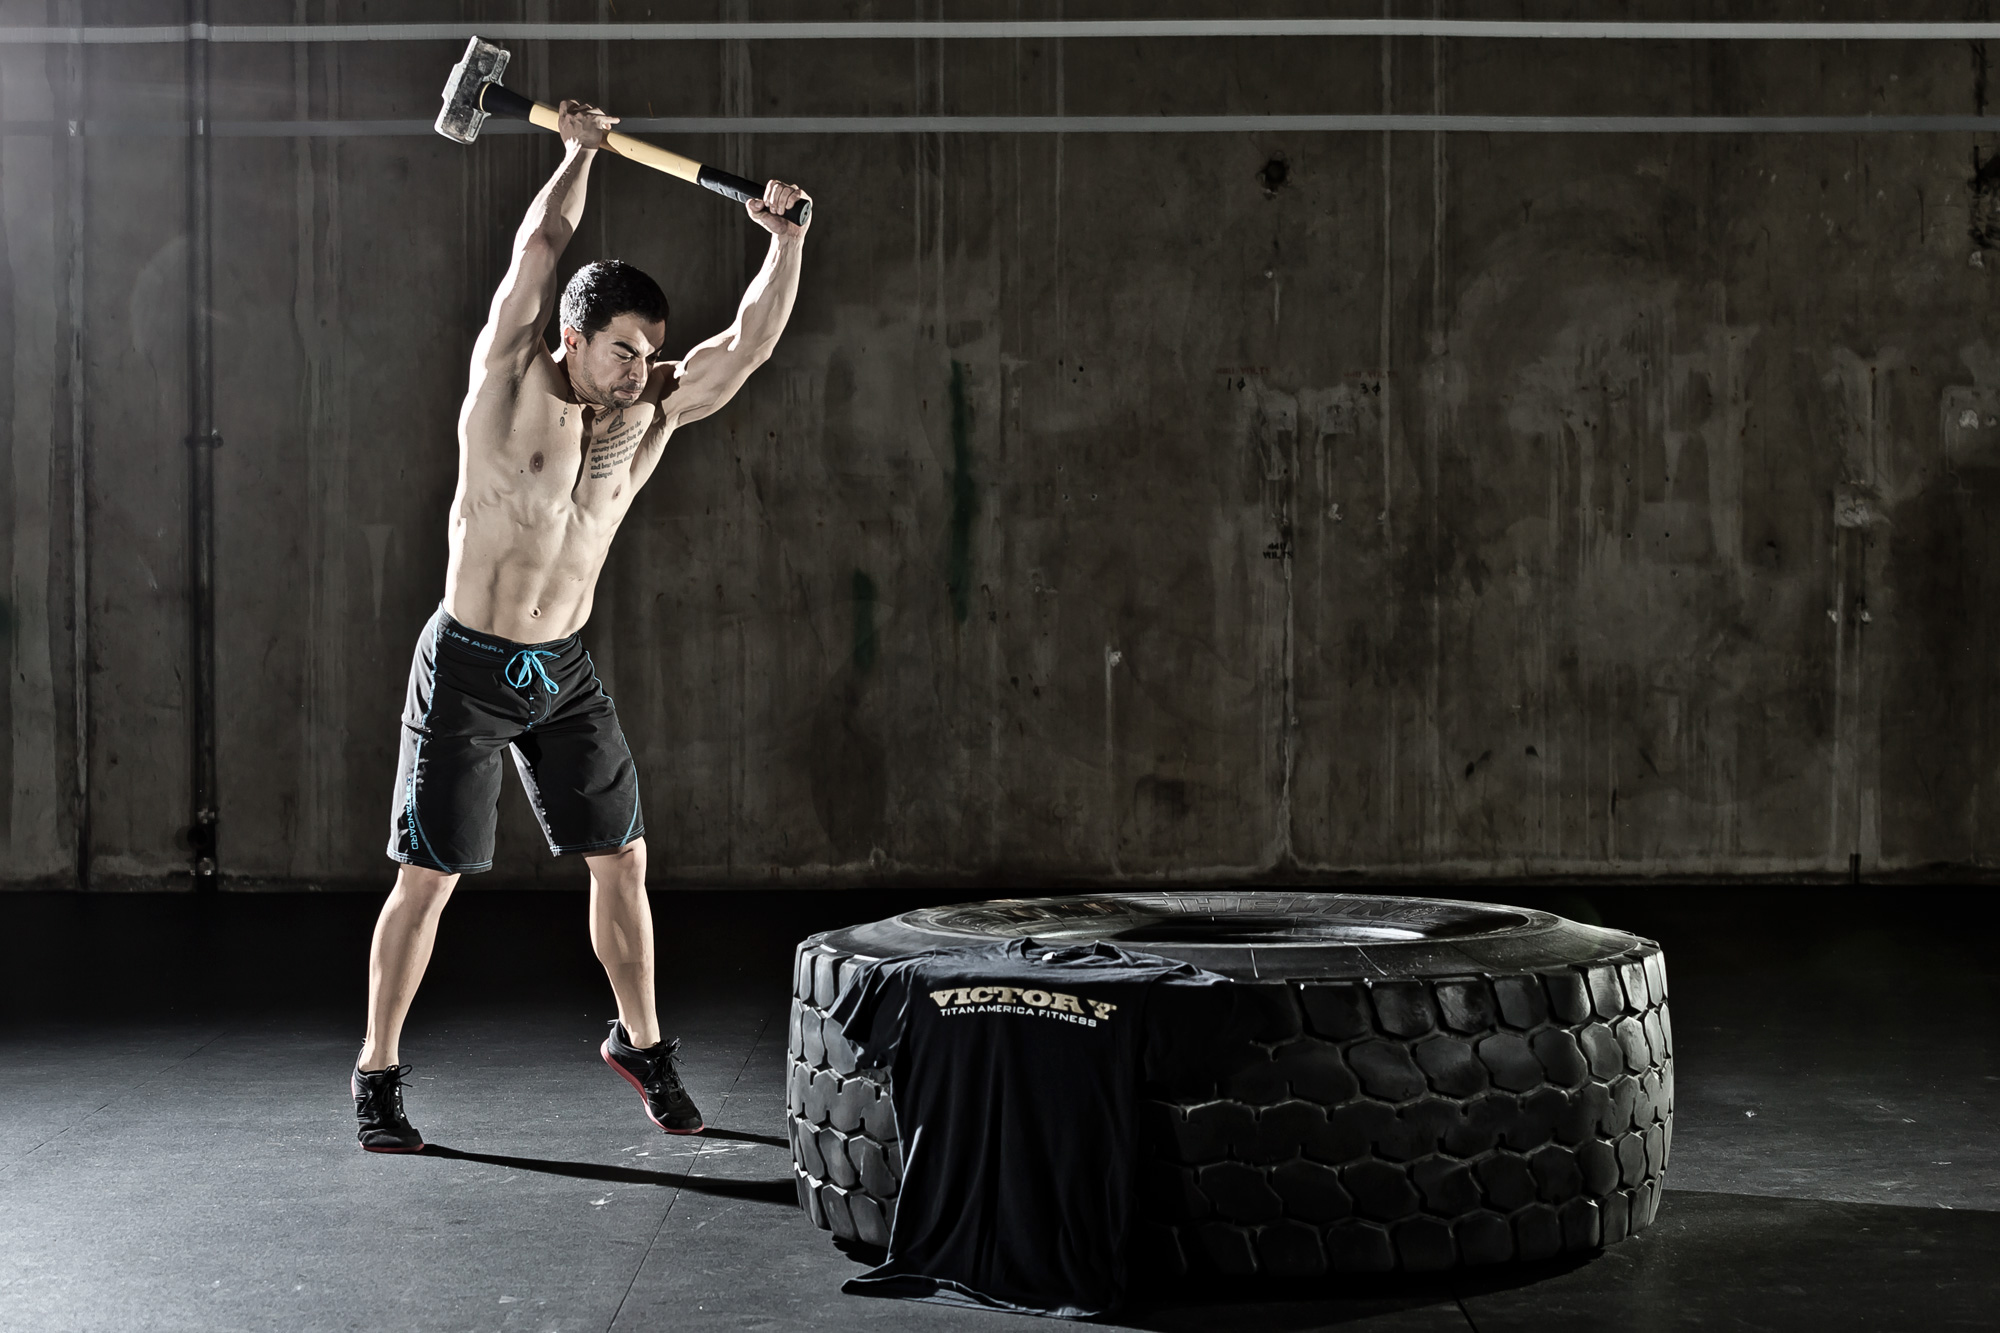 antrenament de forta, fitness, victor diaconescu, personal trainer, sibiu